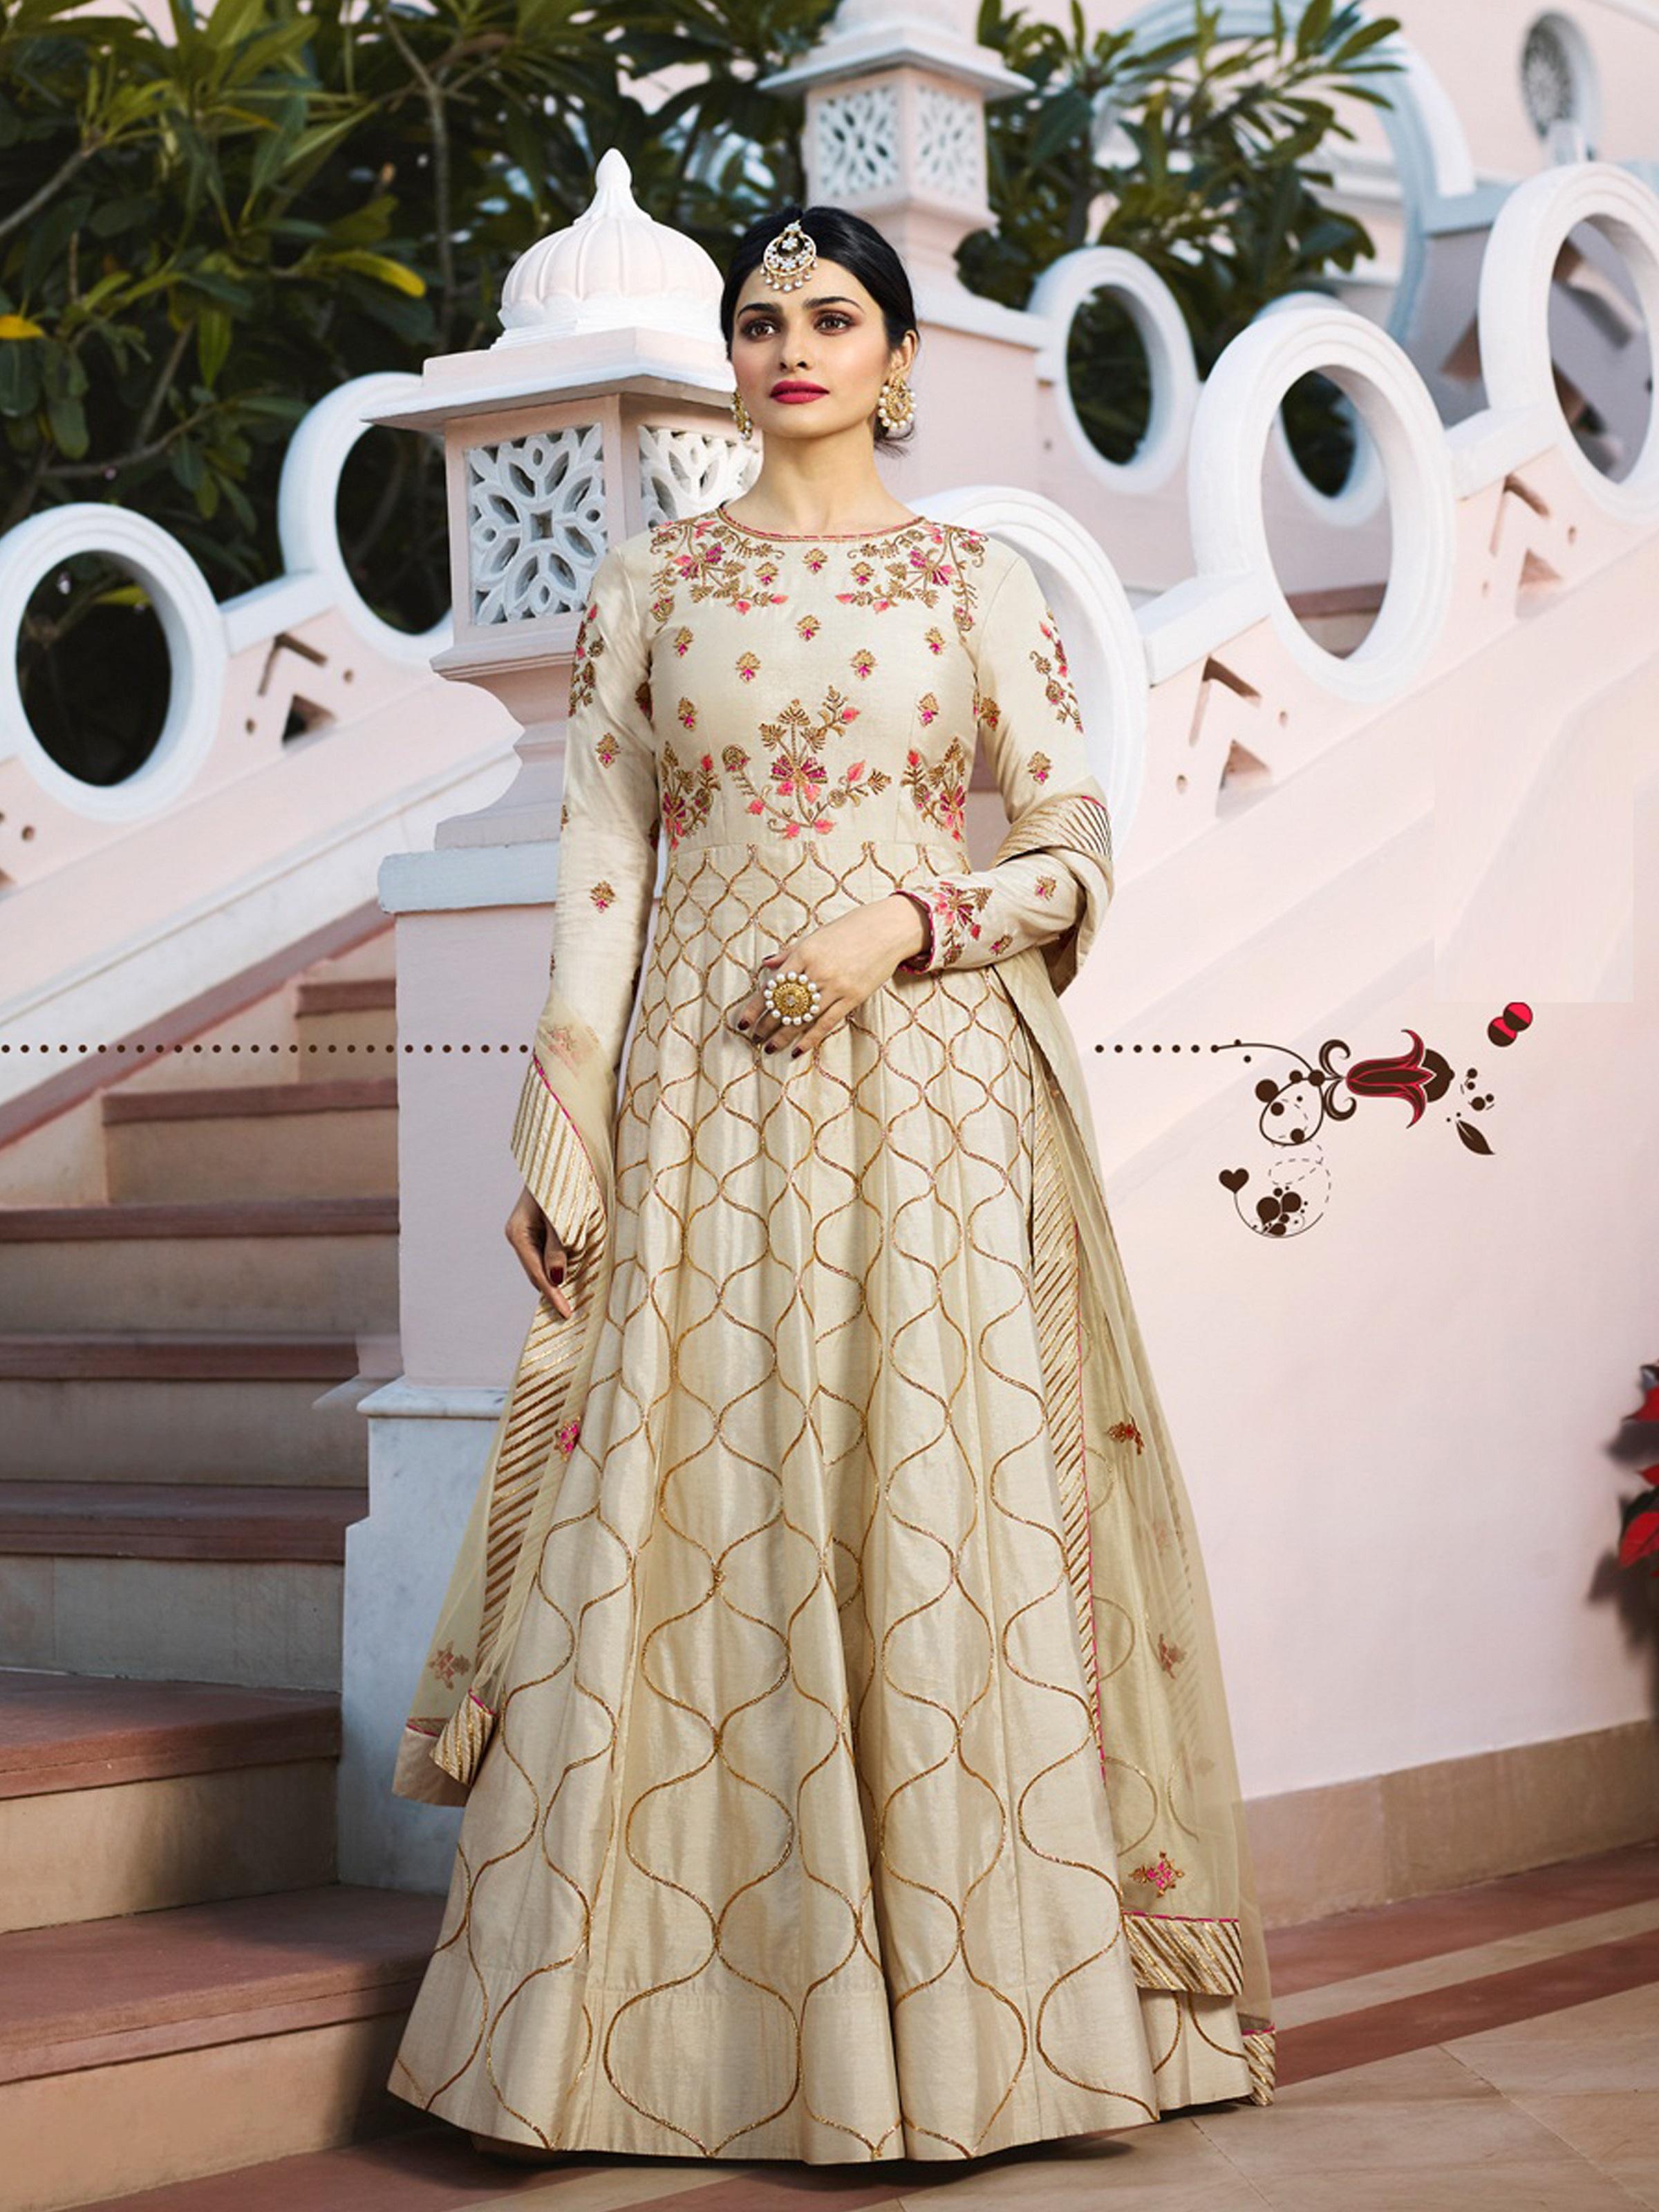 a99b762f7b Beige Embroidered Chanderi Silk Anarkali Suit - Divine International  Trading Co - 2736994